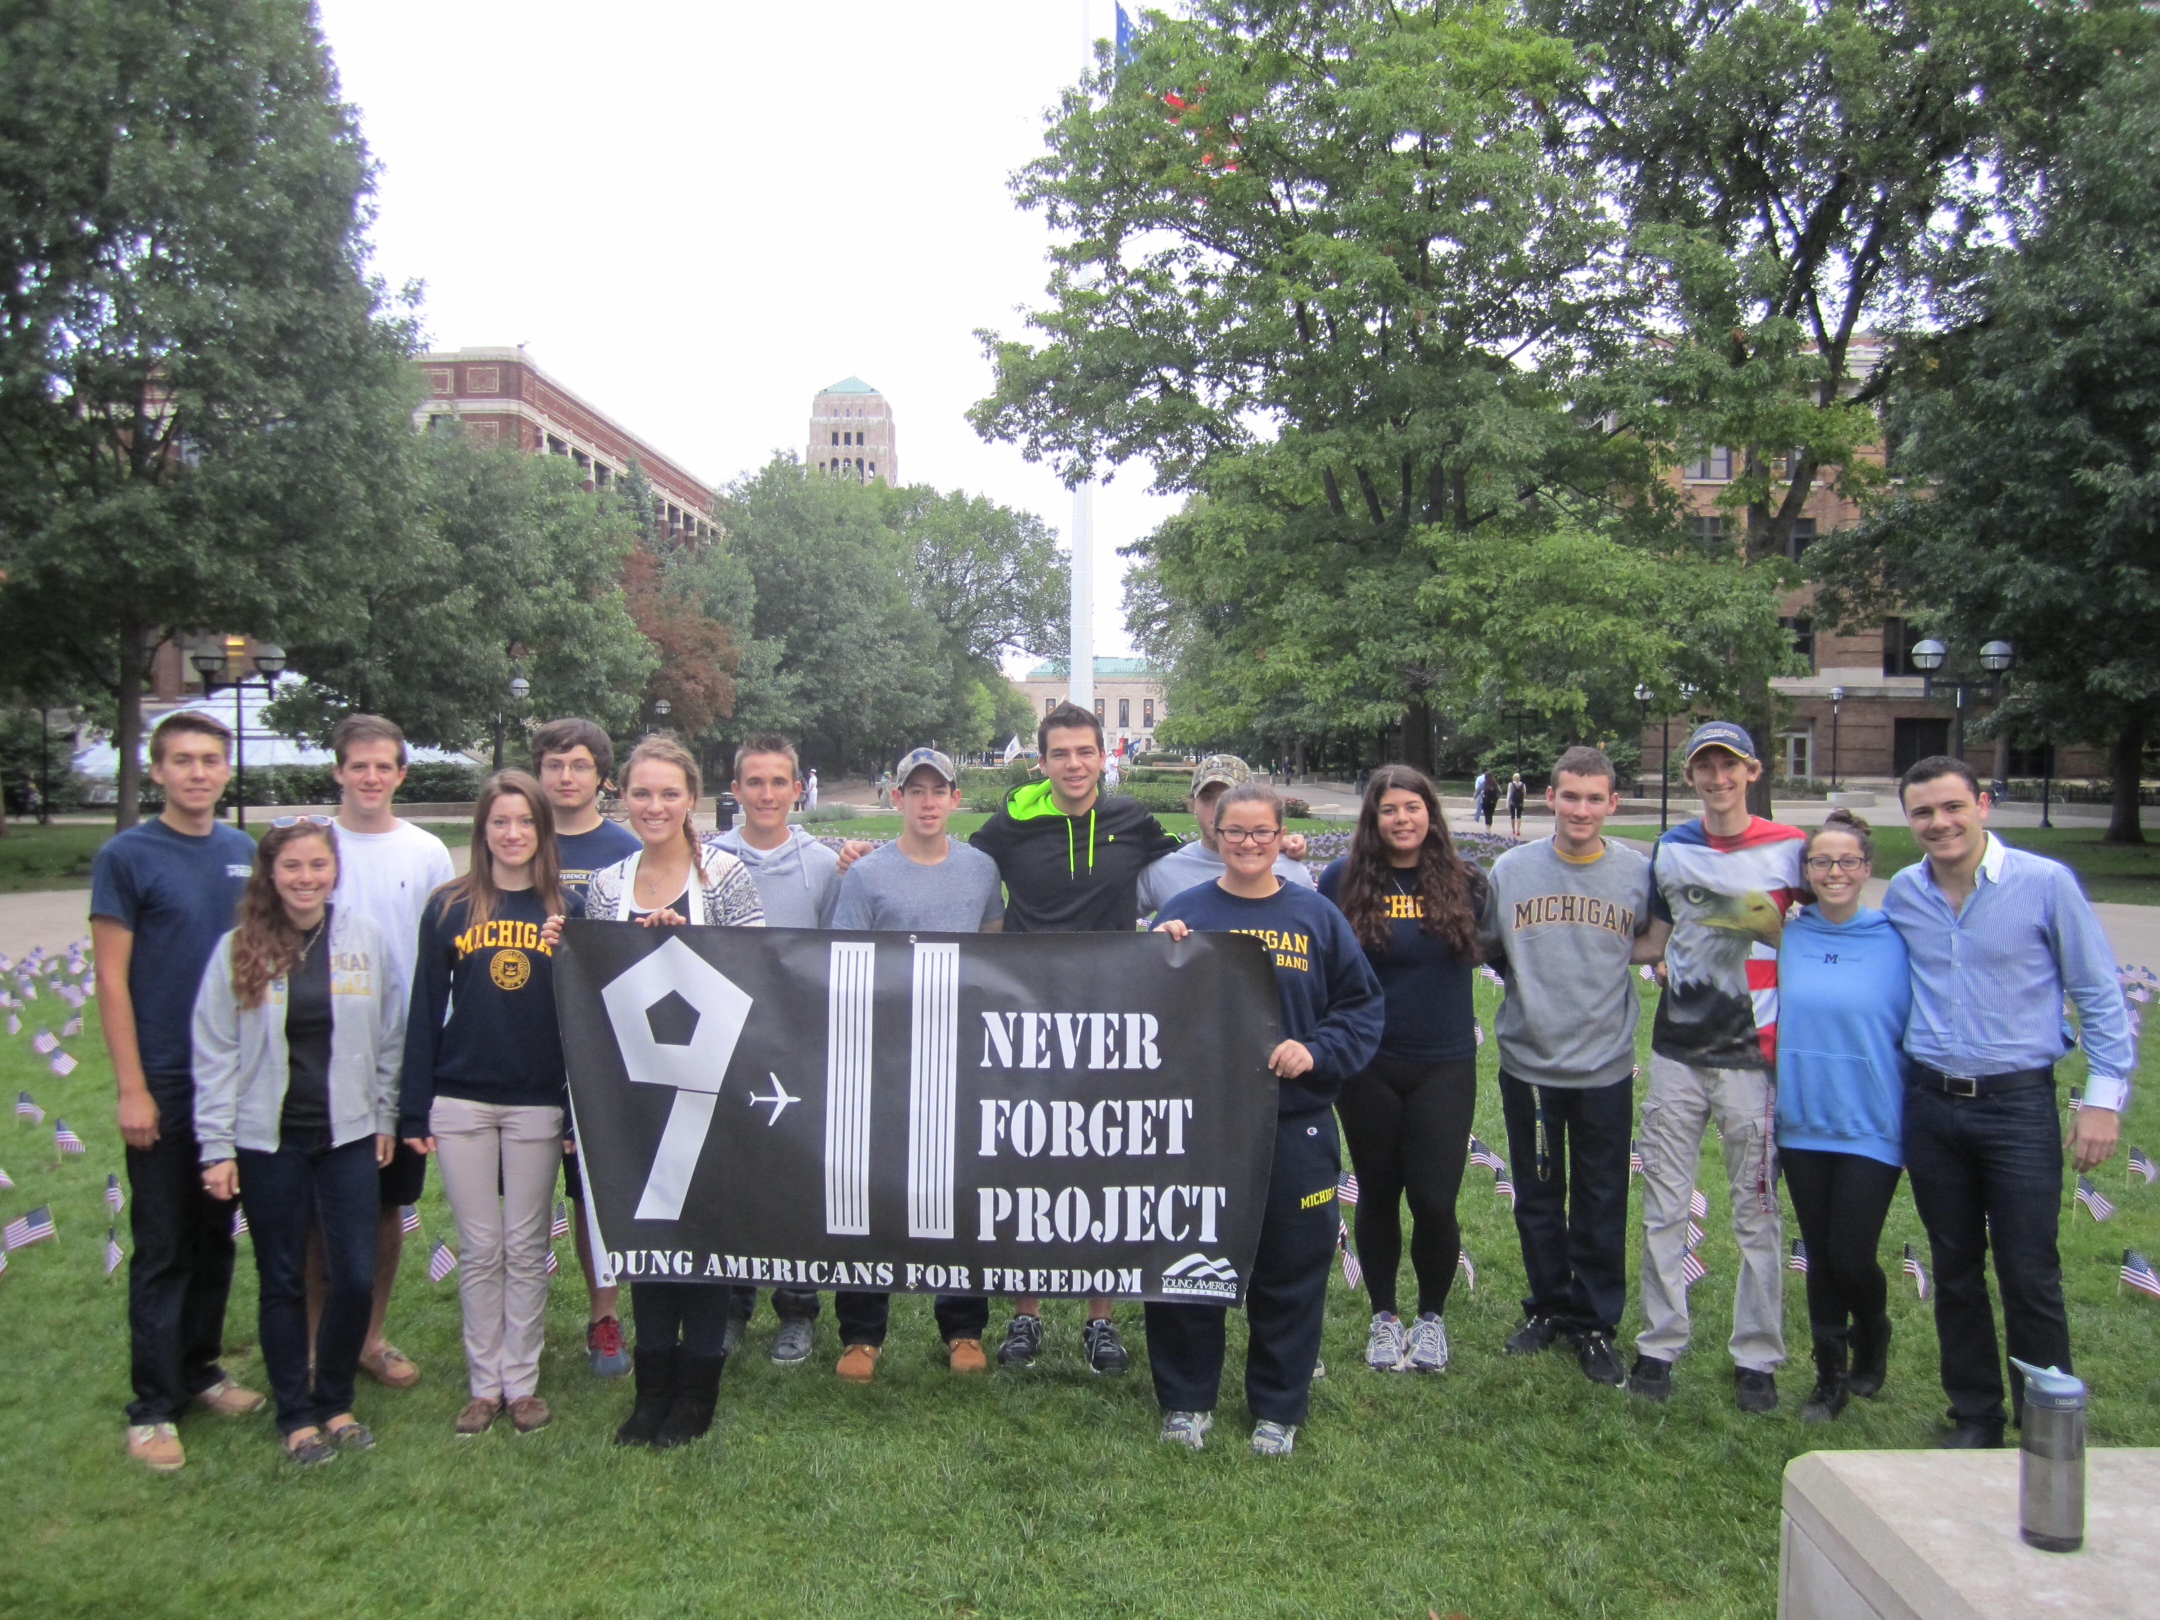 University of Michigan 2014